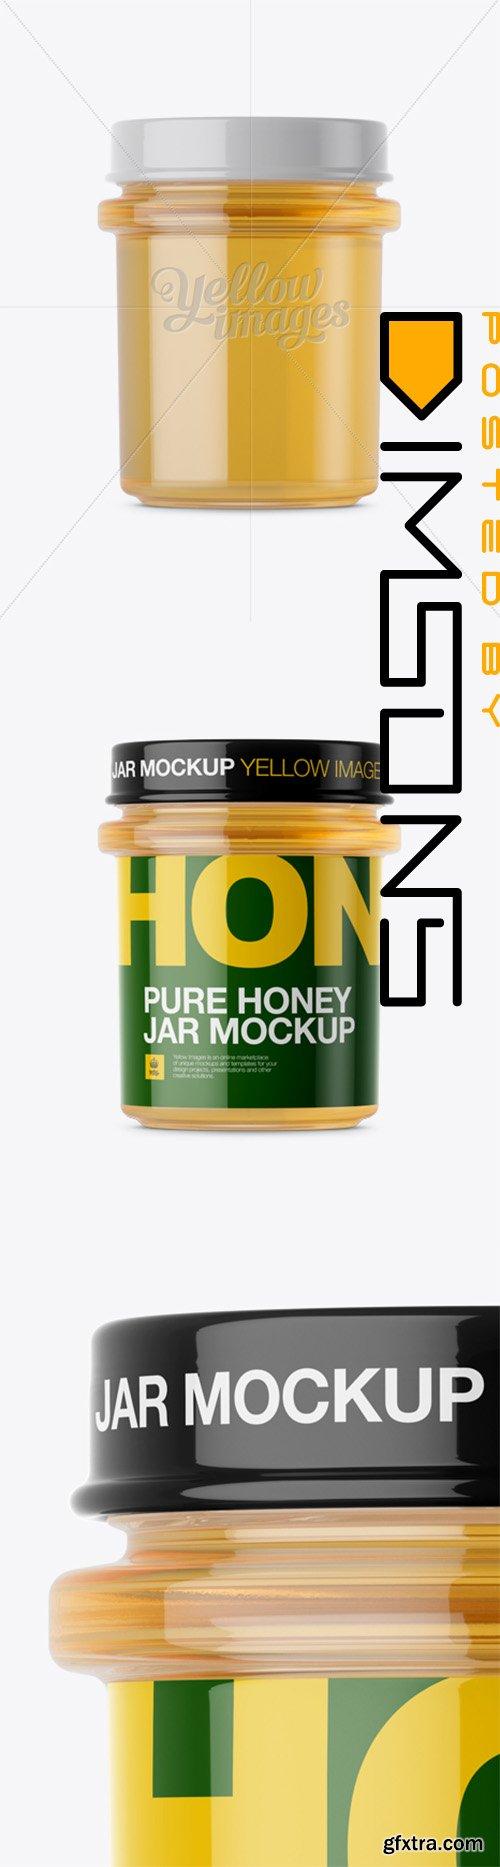 Pure Honey Jar Mockup - Front View 13879